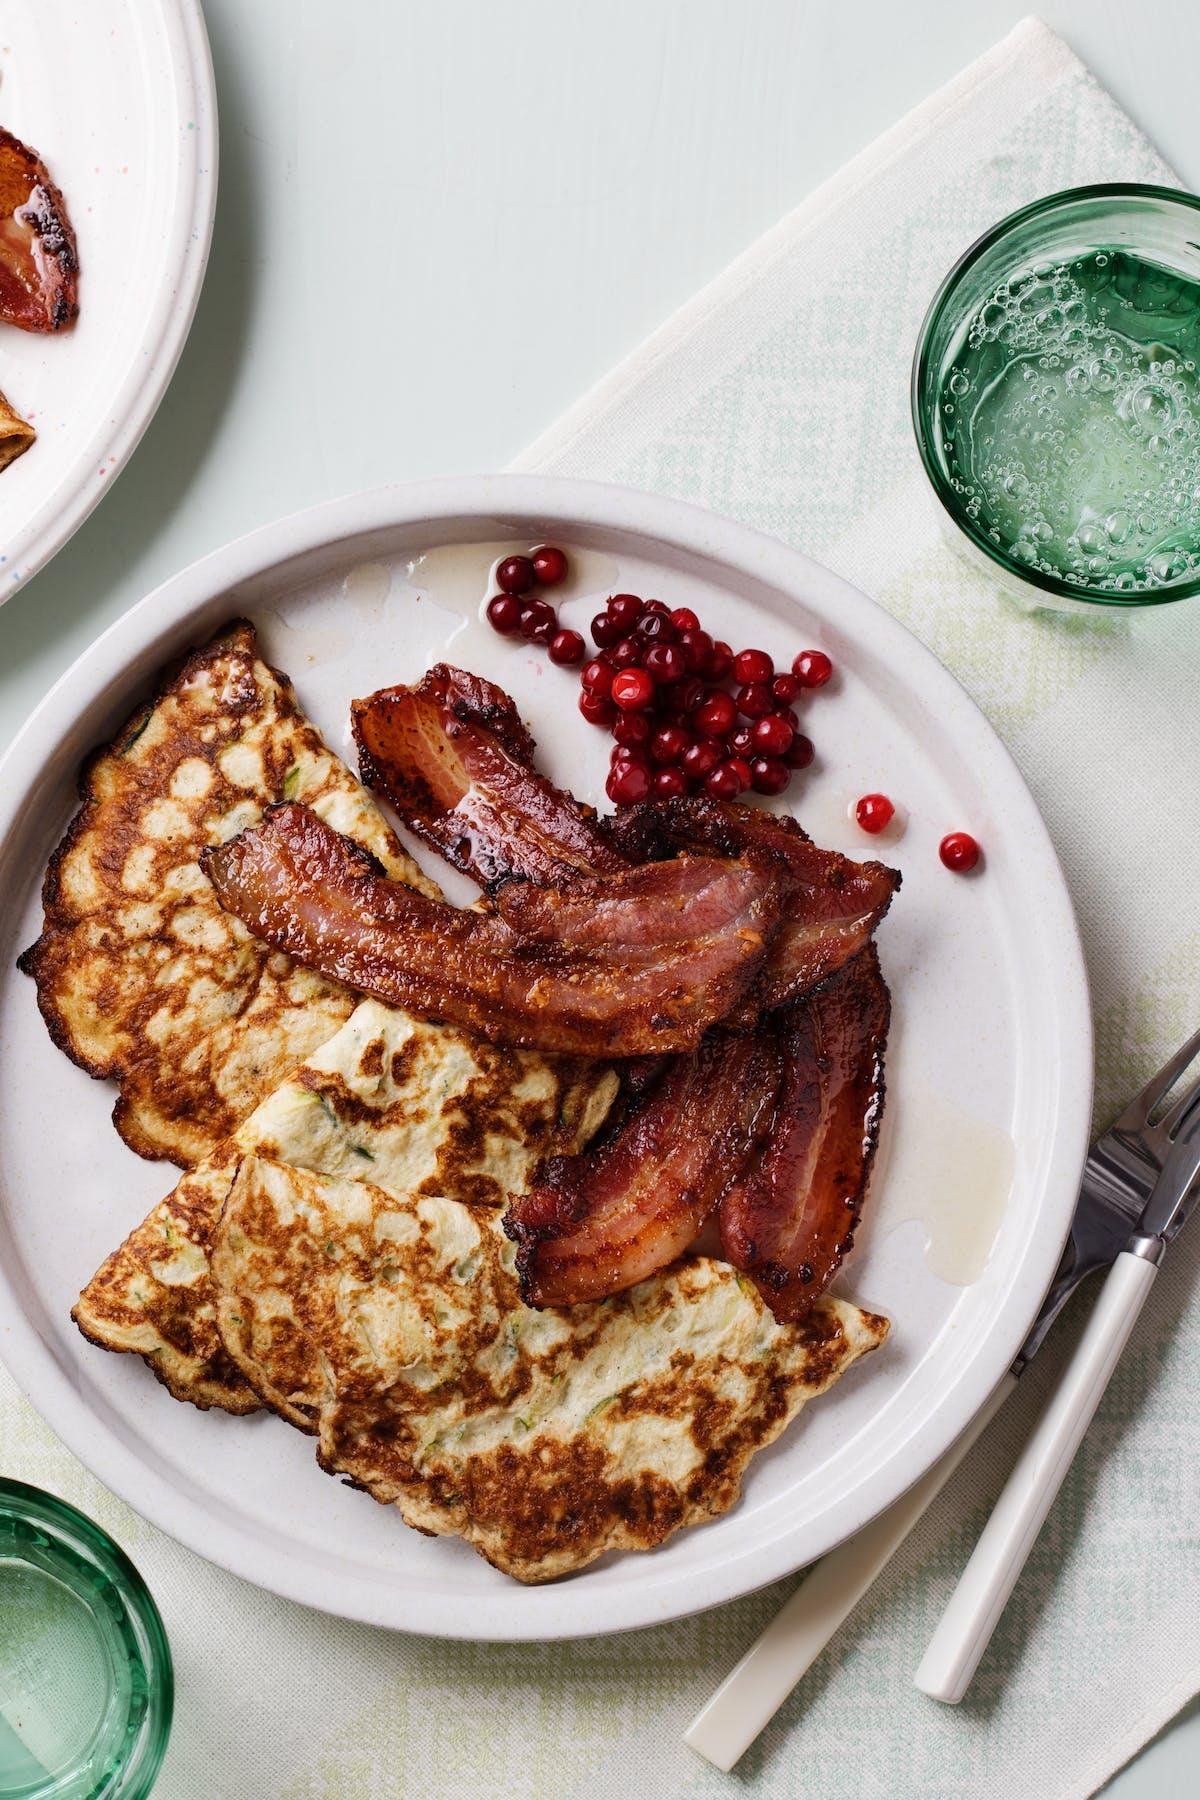 Keto fauxtato pancakes with bacon